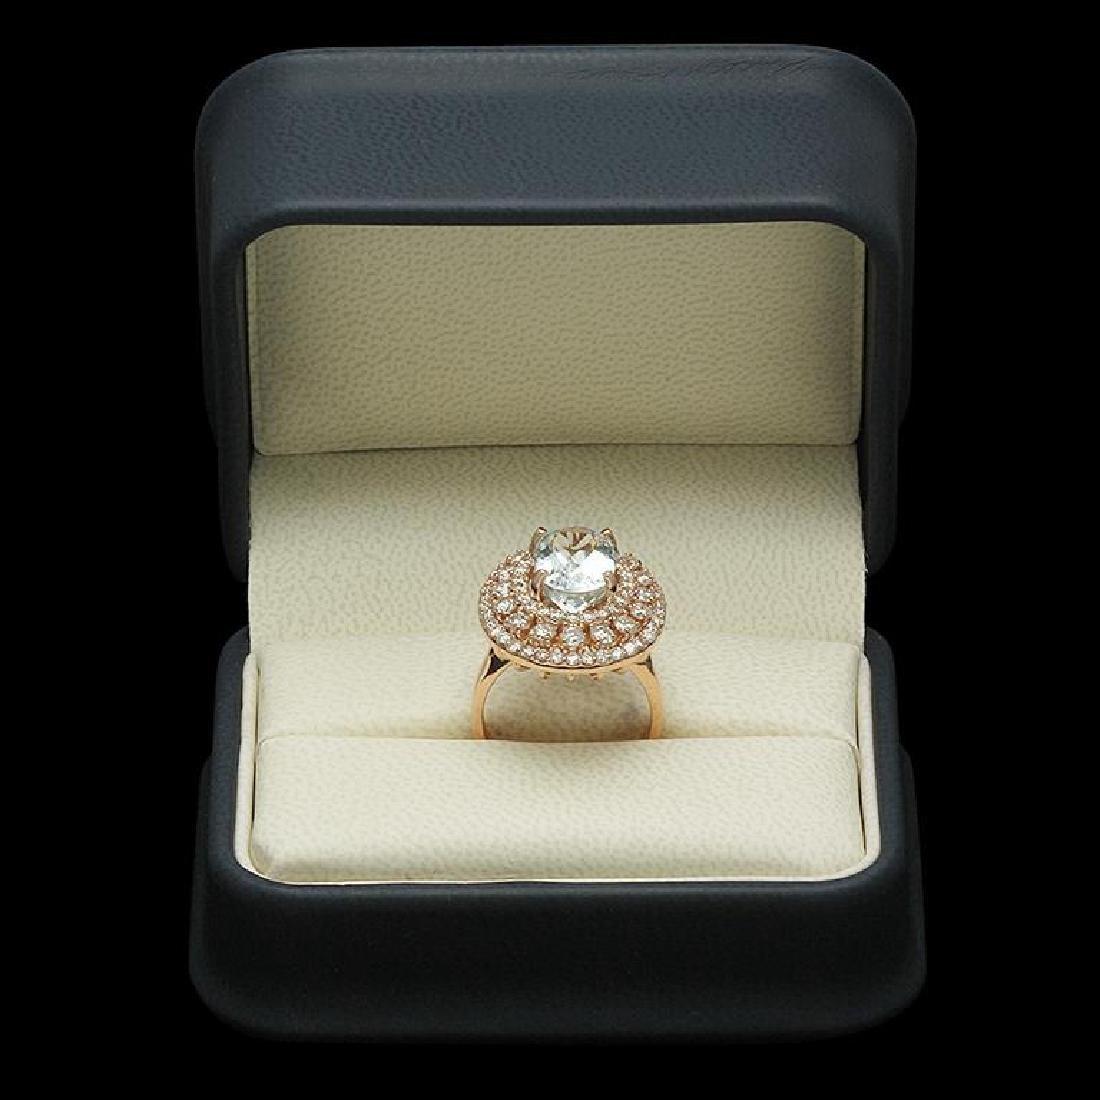 14K Gold 4.35ct Aquamarine 2.09ct Diamond Ring - 3